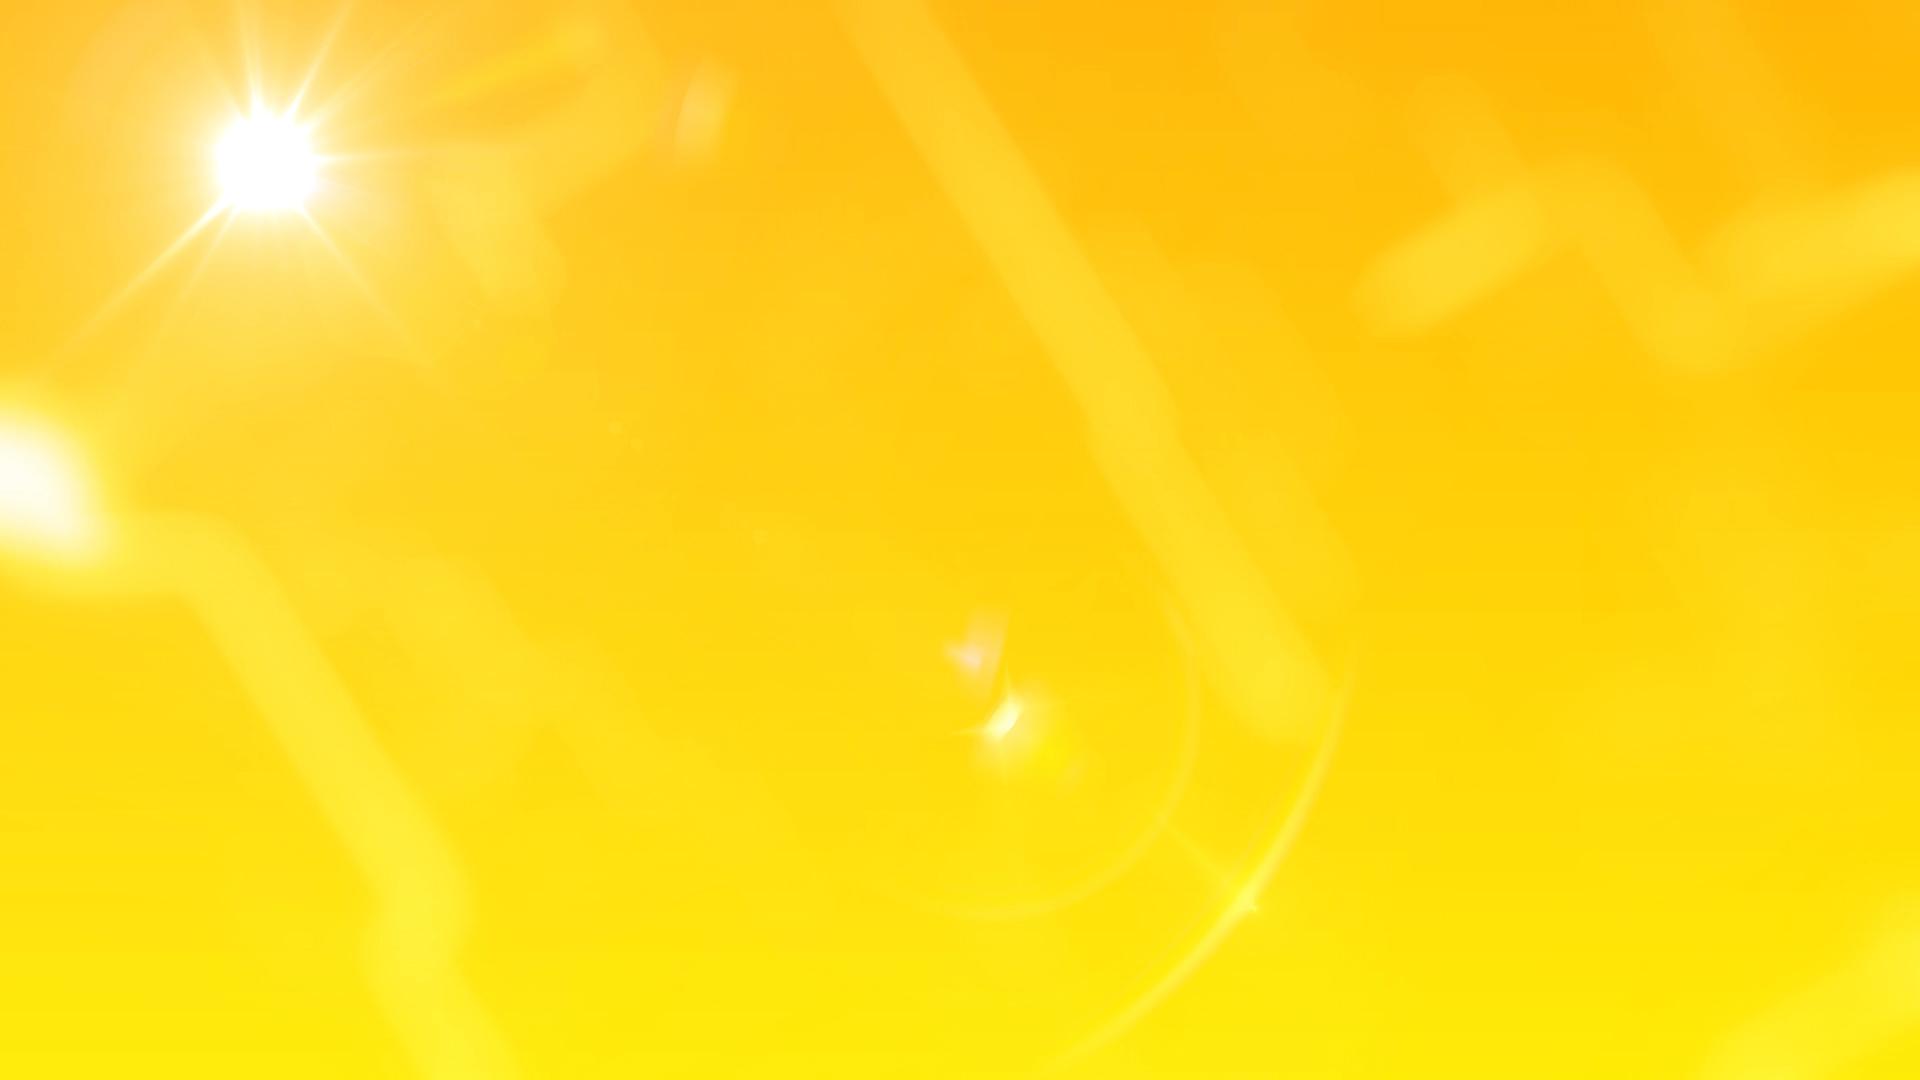 Background Dark Yellow Hd - 1920x1080 ...